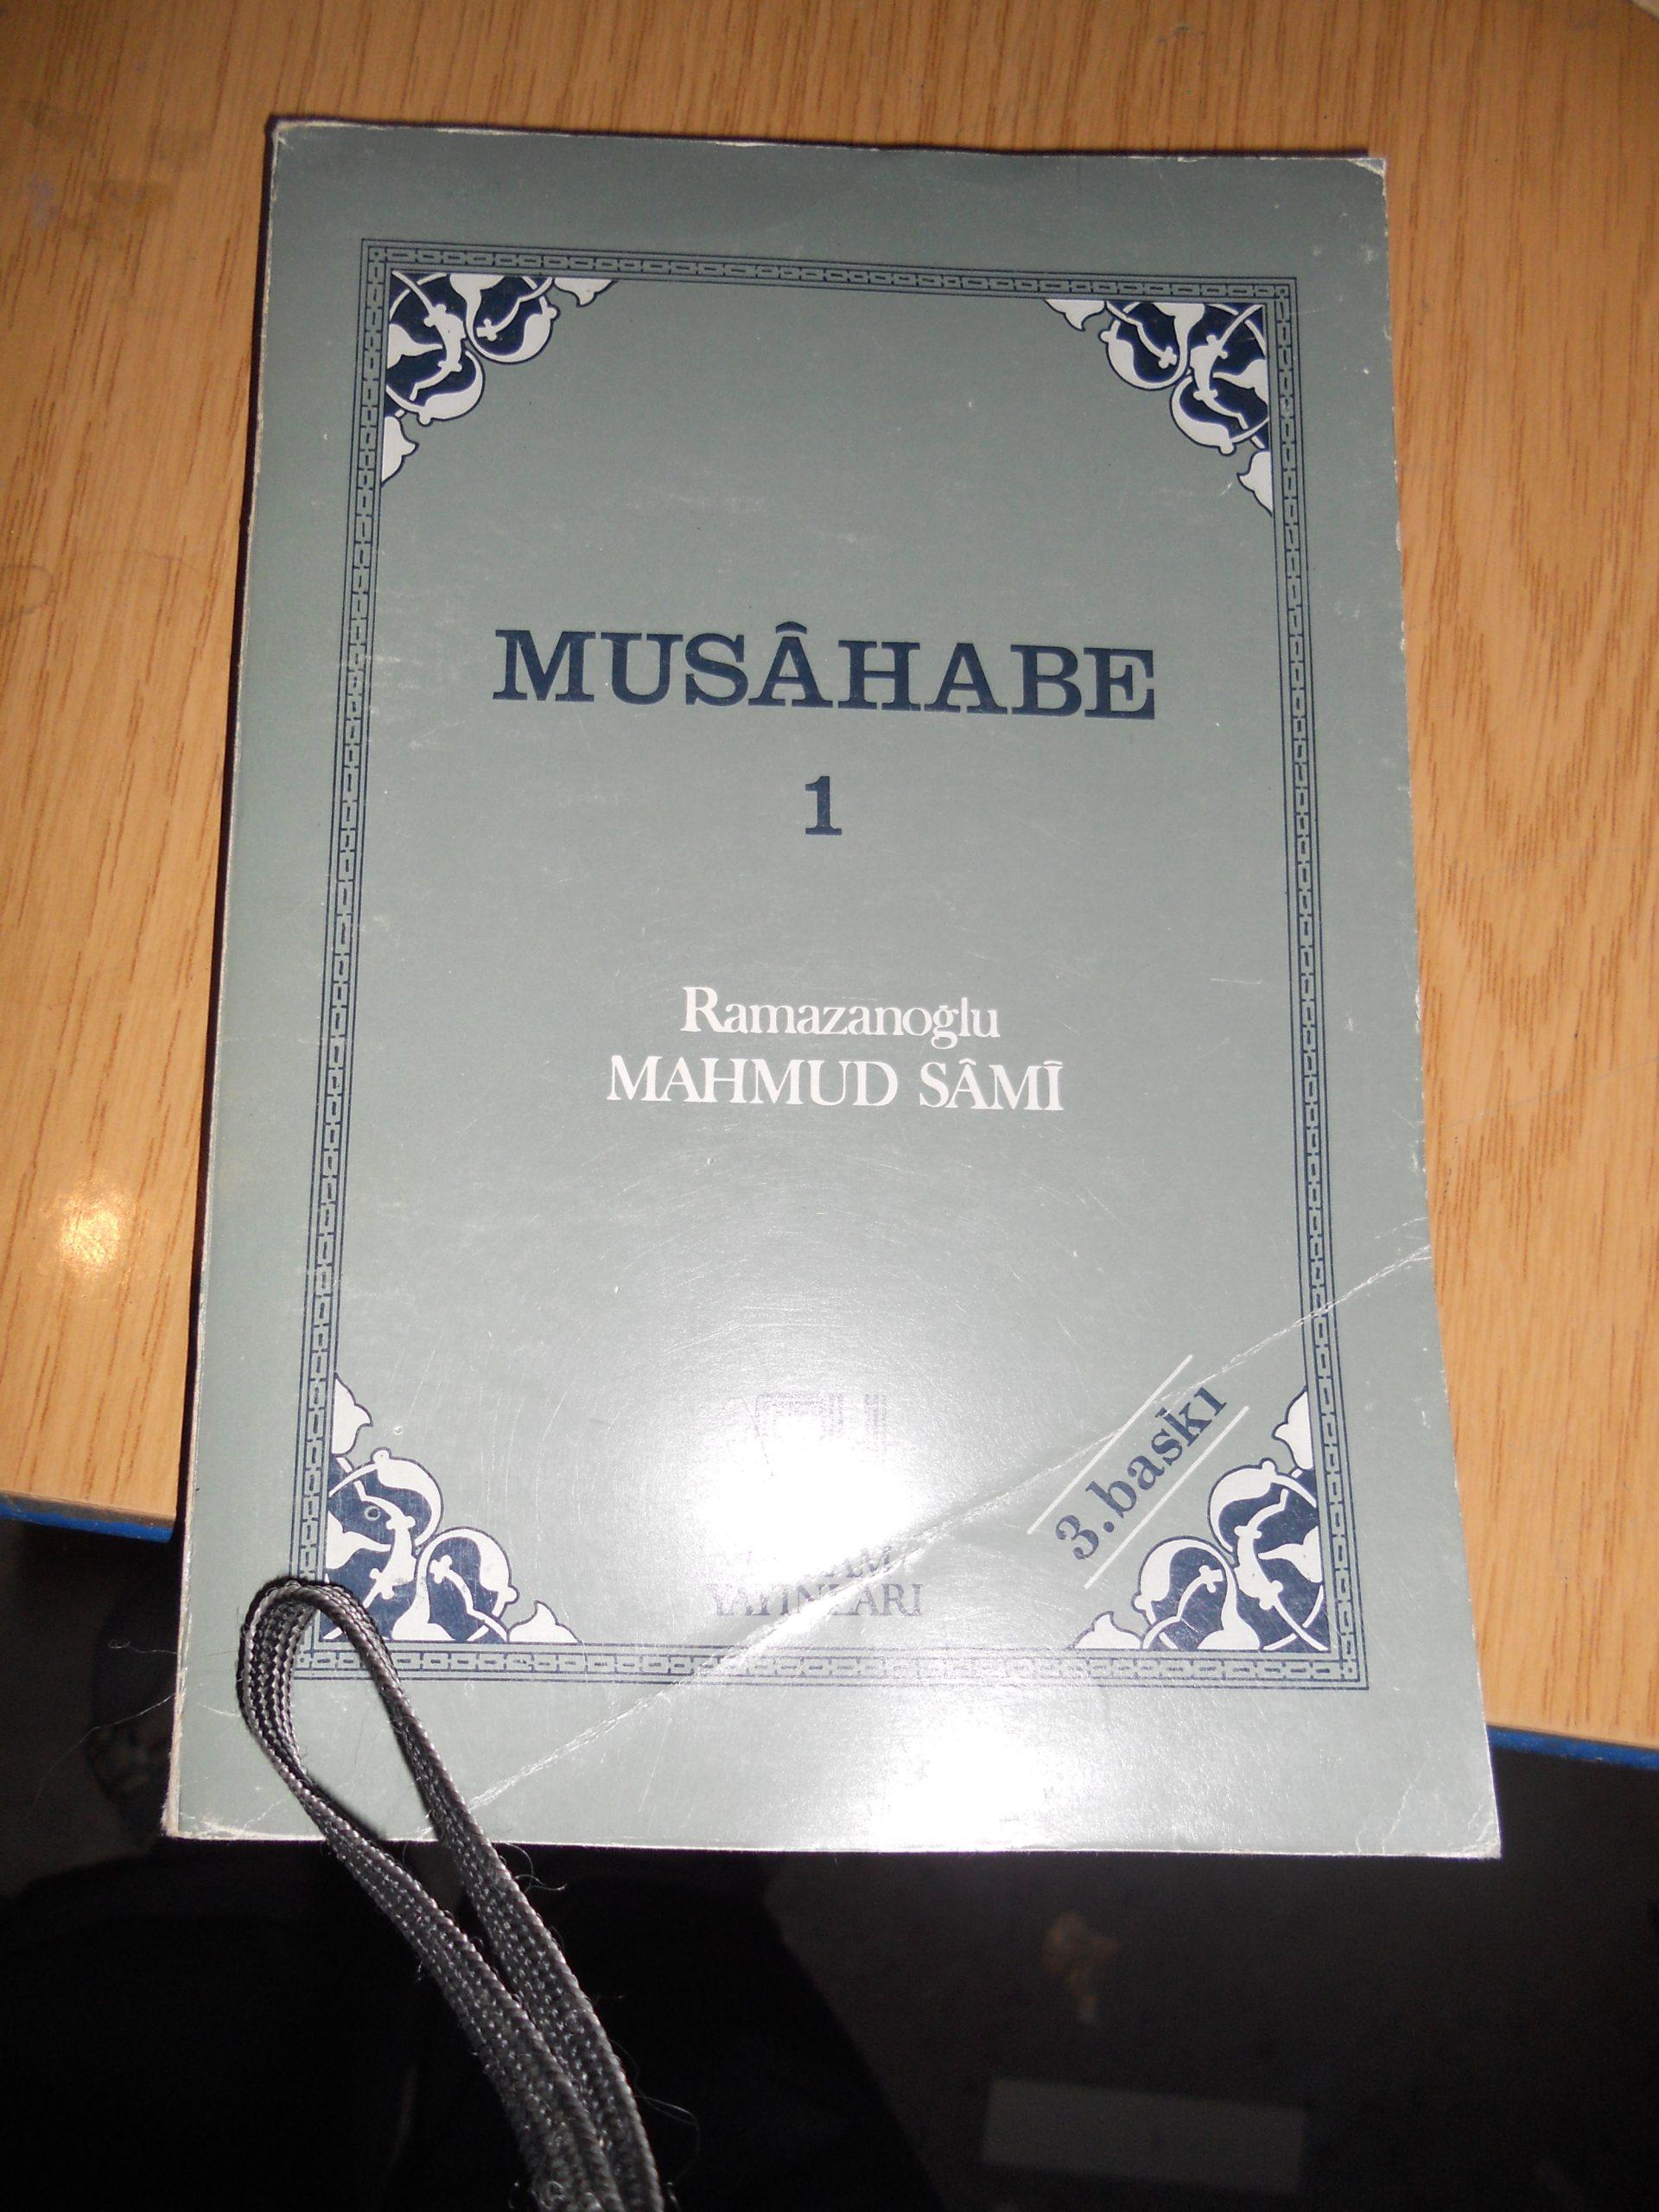 MUSAHABE-1 ve 5/ Ramazanoğlu Mahmud Sami/ iki kitap toplam.15 tl